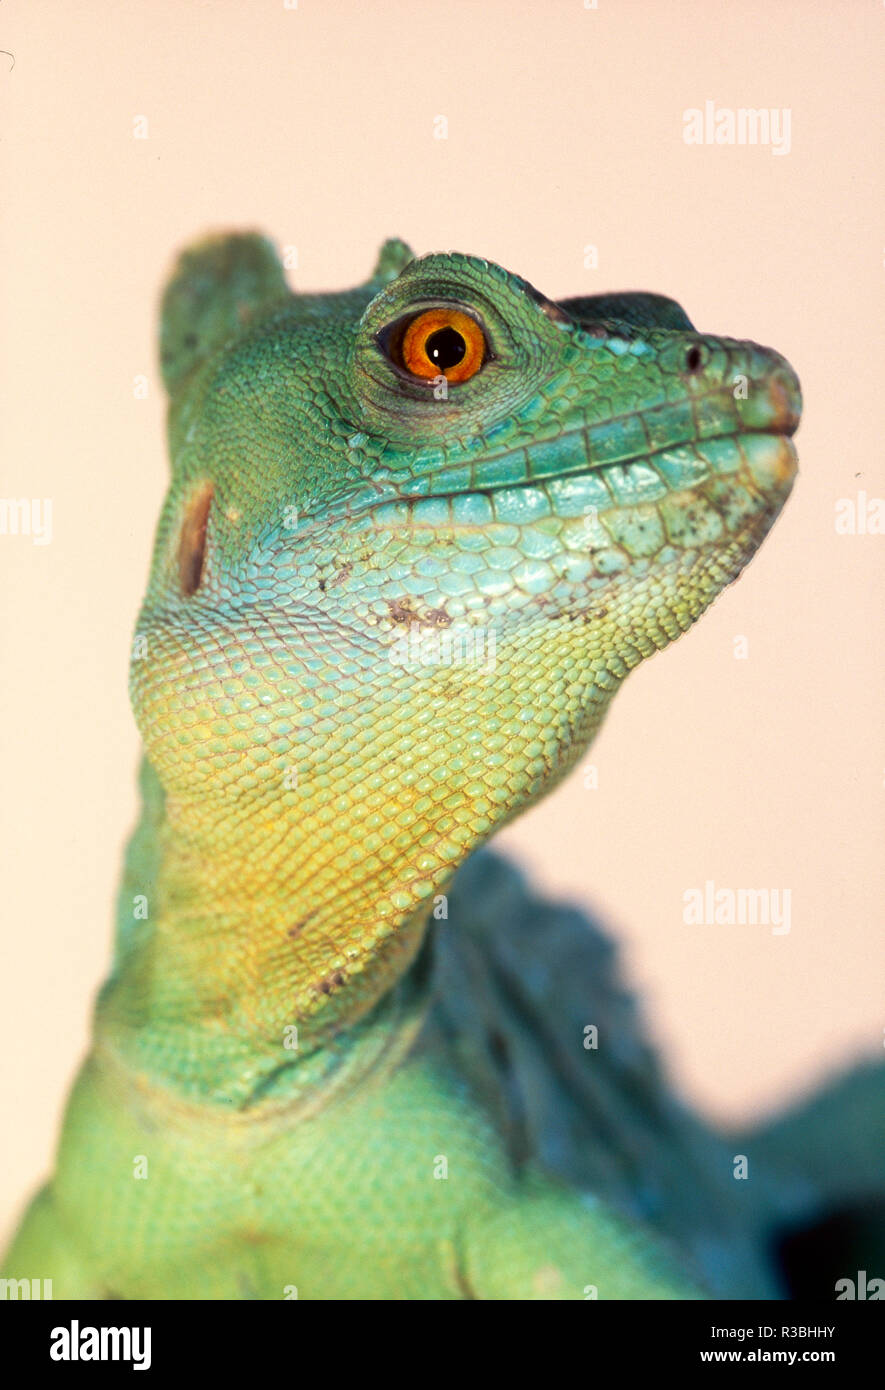 Basilisk Lizard (Basiliscus sp.), alias Jesus Lizard, close-up gegen hellen Hintergrund, Brasilien Regenwald Stockbild